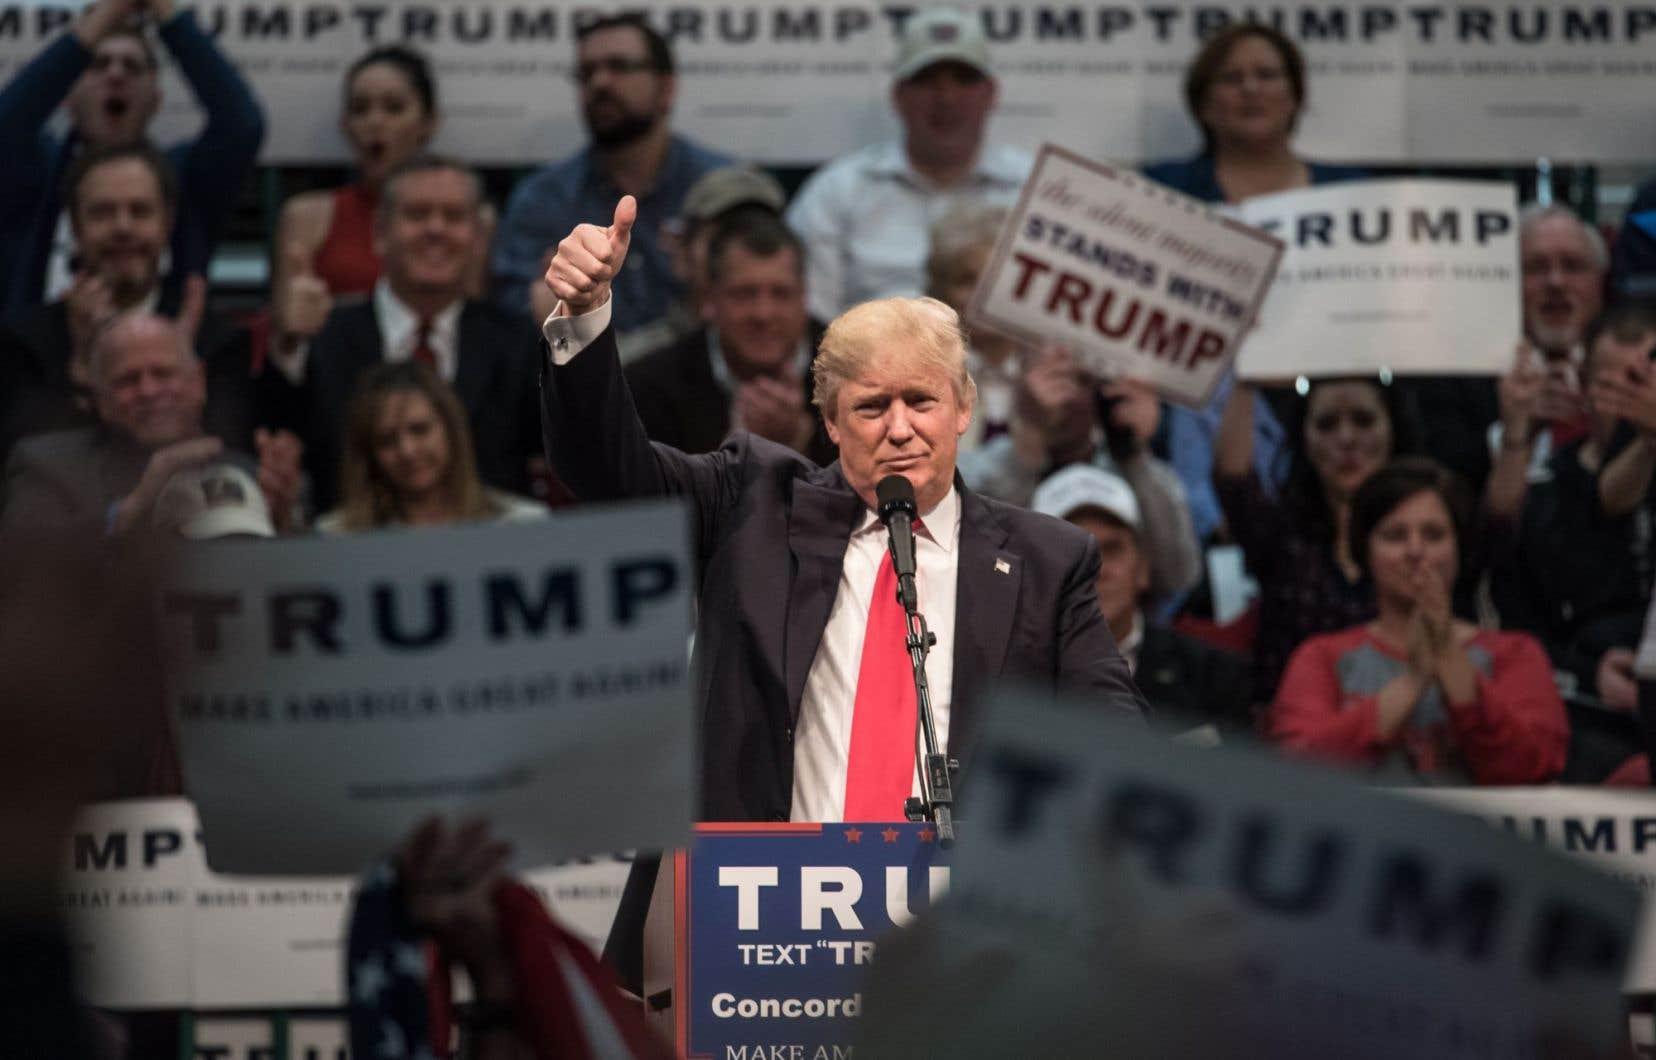 Donald Trump a gagné quinze des vingt-quatre caucus et primaires ayant eu lieu jusqu'ici.